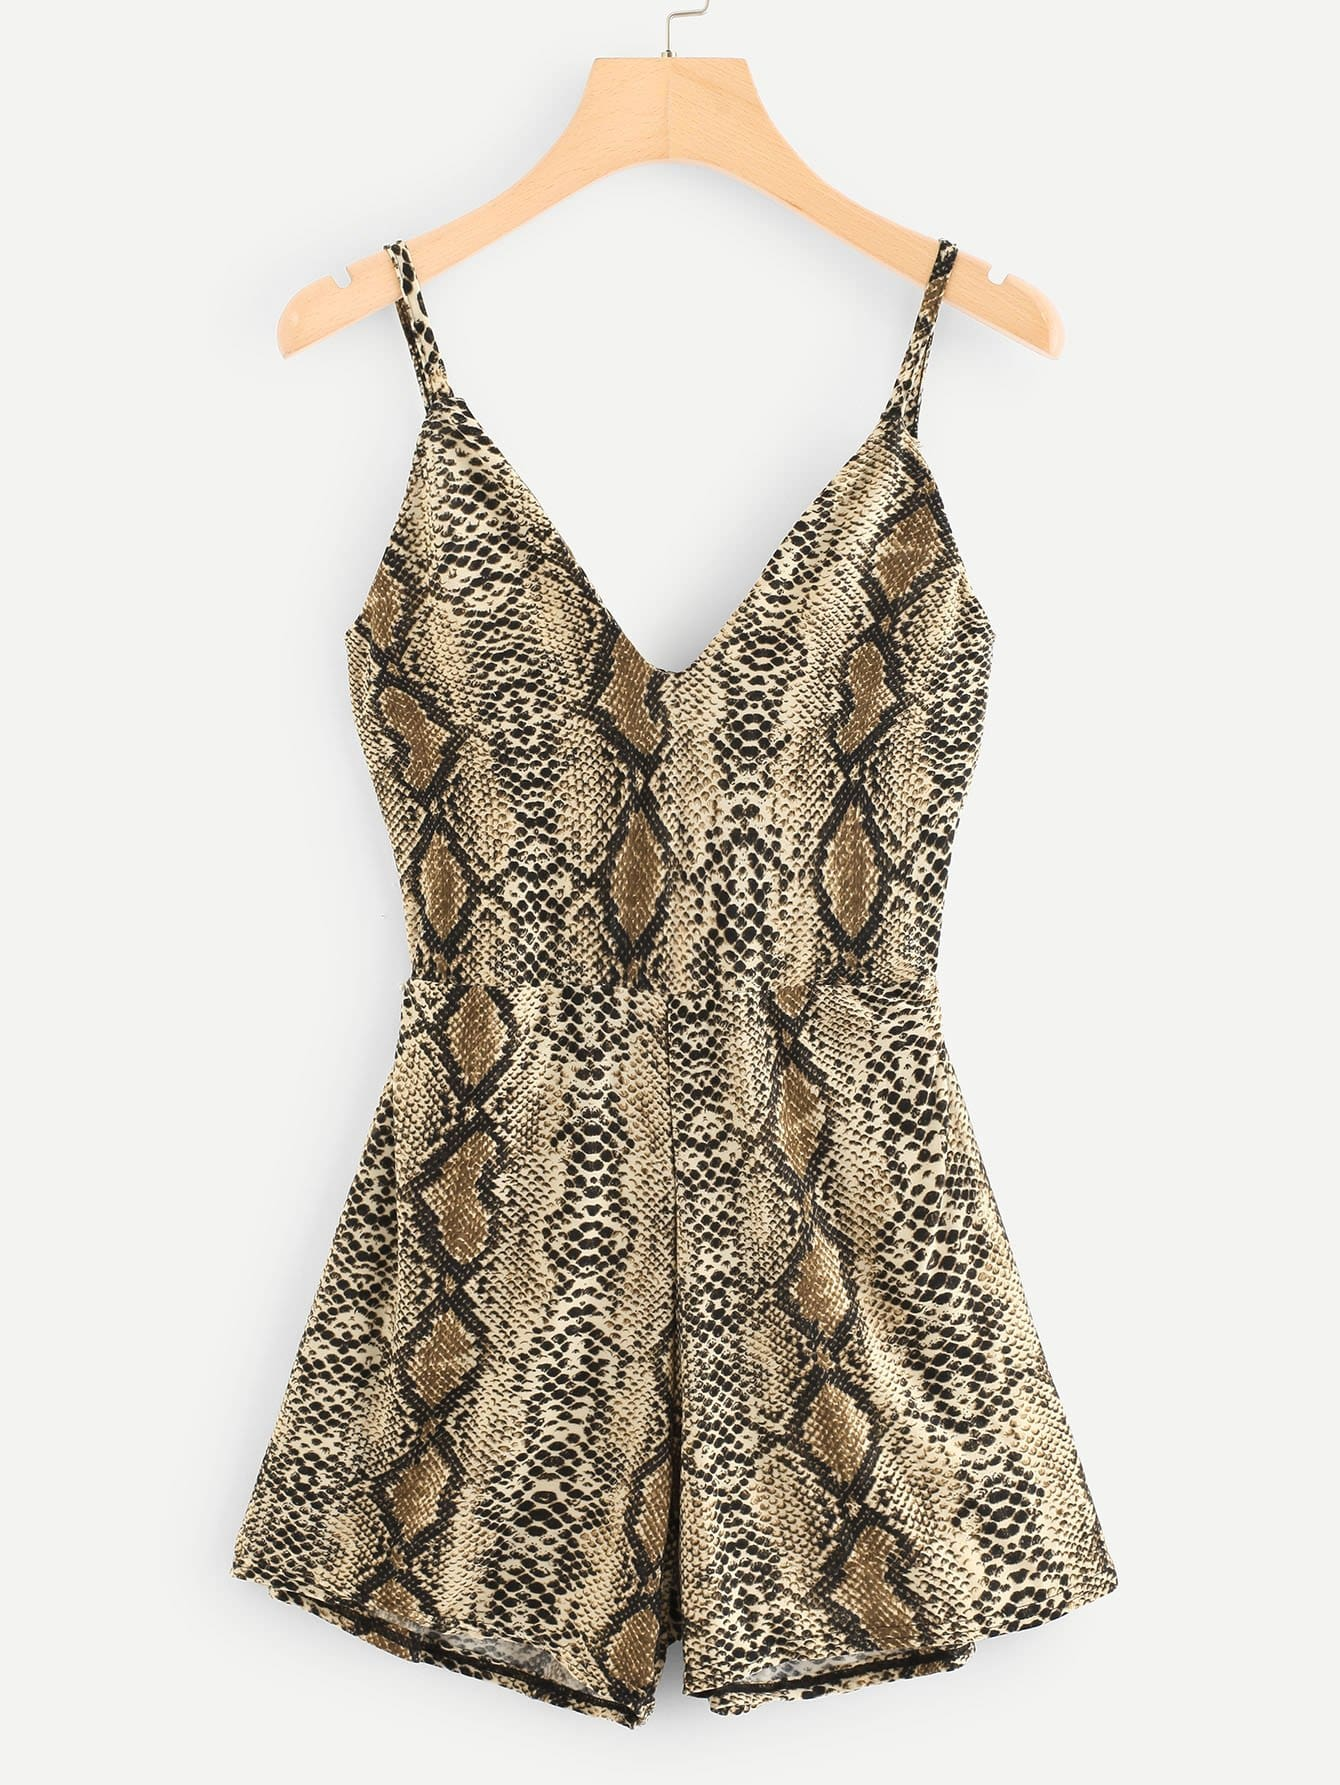 Lace Up Back Snakeskin Jumpsuit lace up open back flare jumpsuit